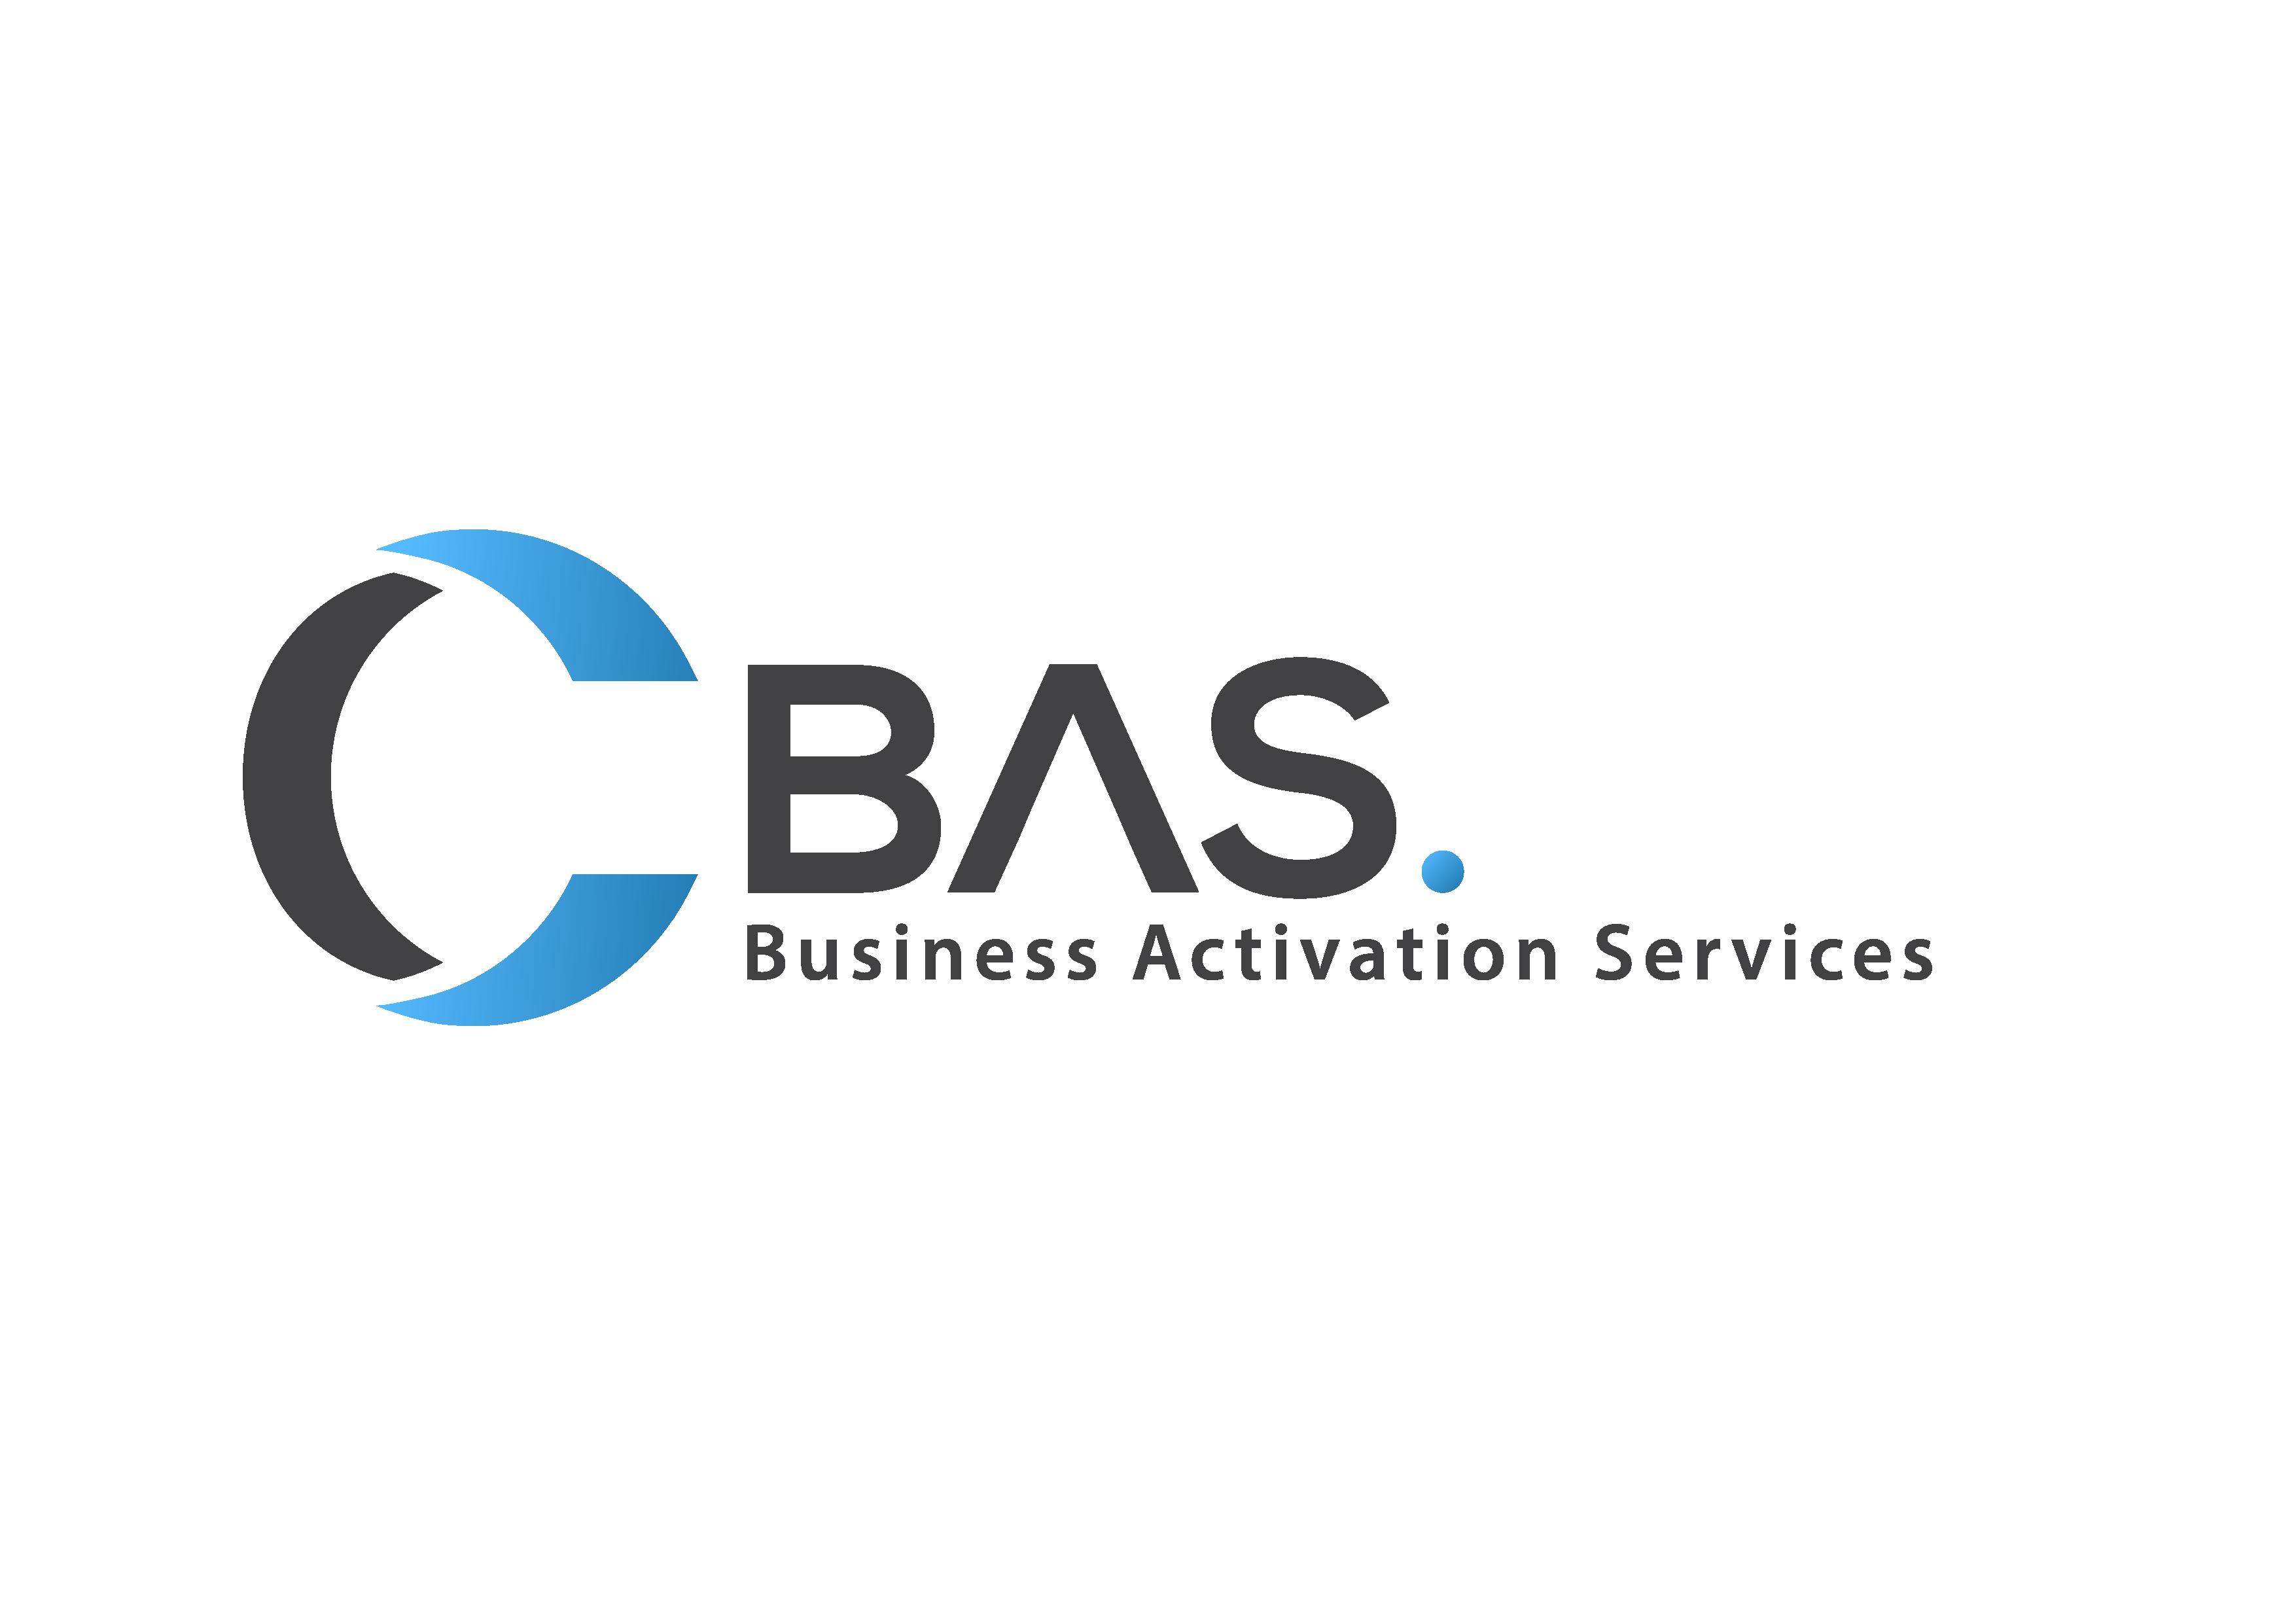 C-BAS